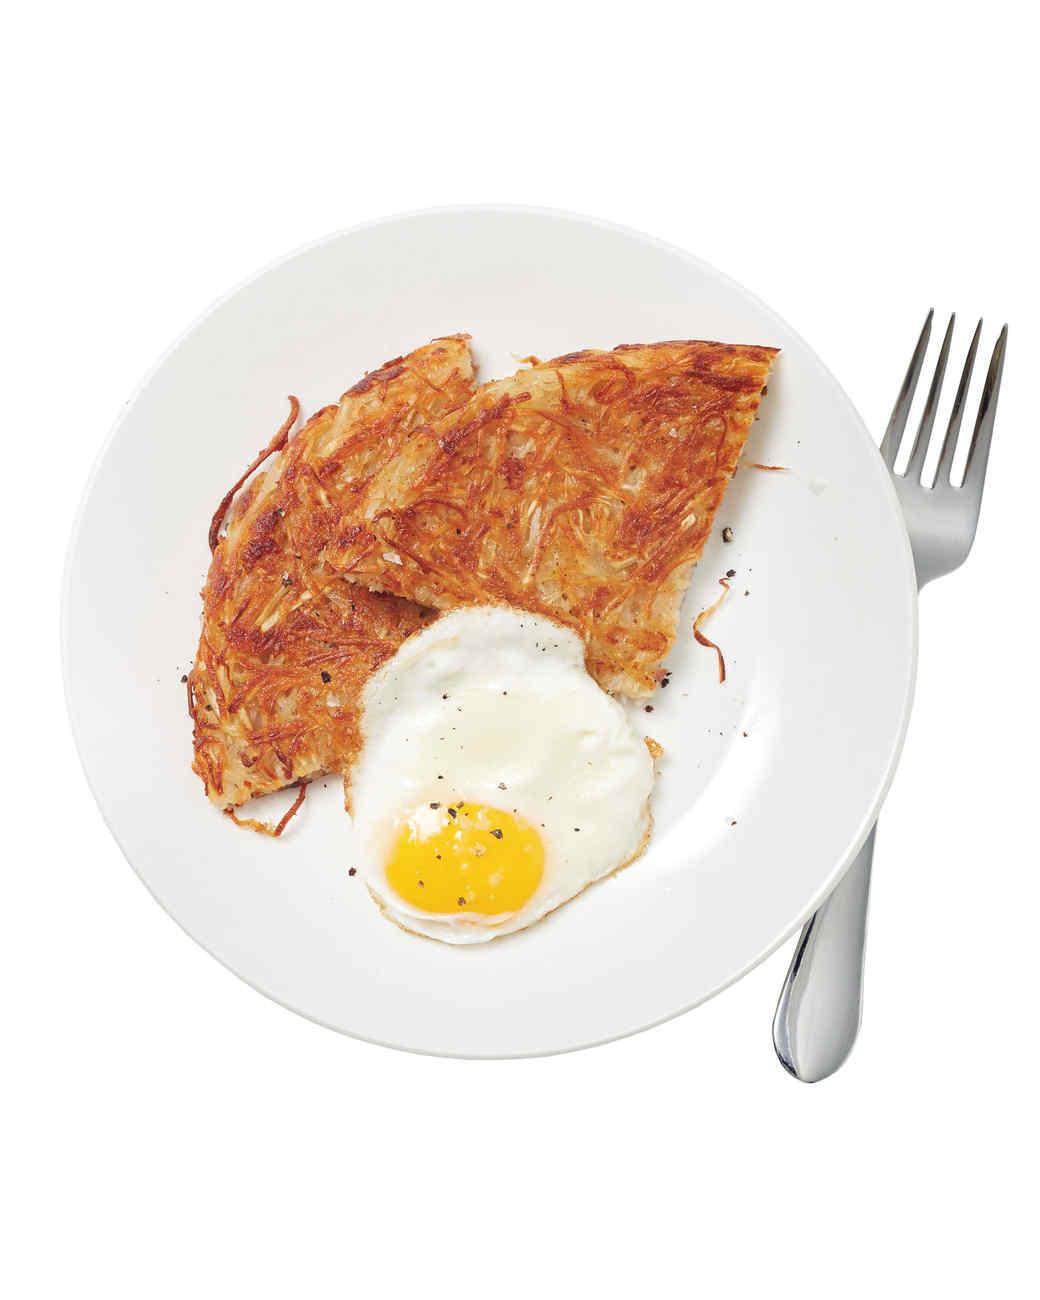 parsnip-and-potato-rosti-fork-034-d112769_l.jpg